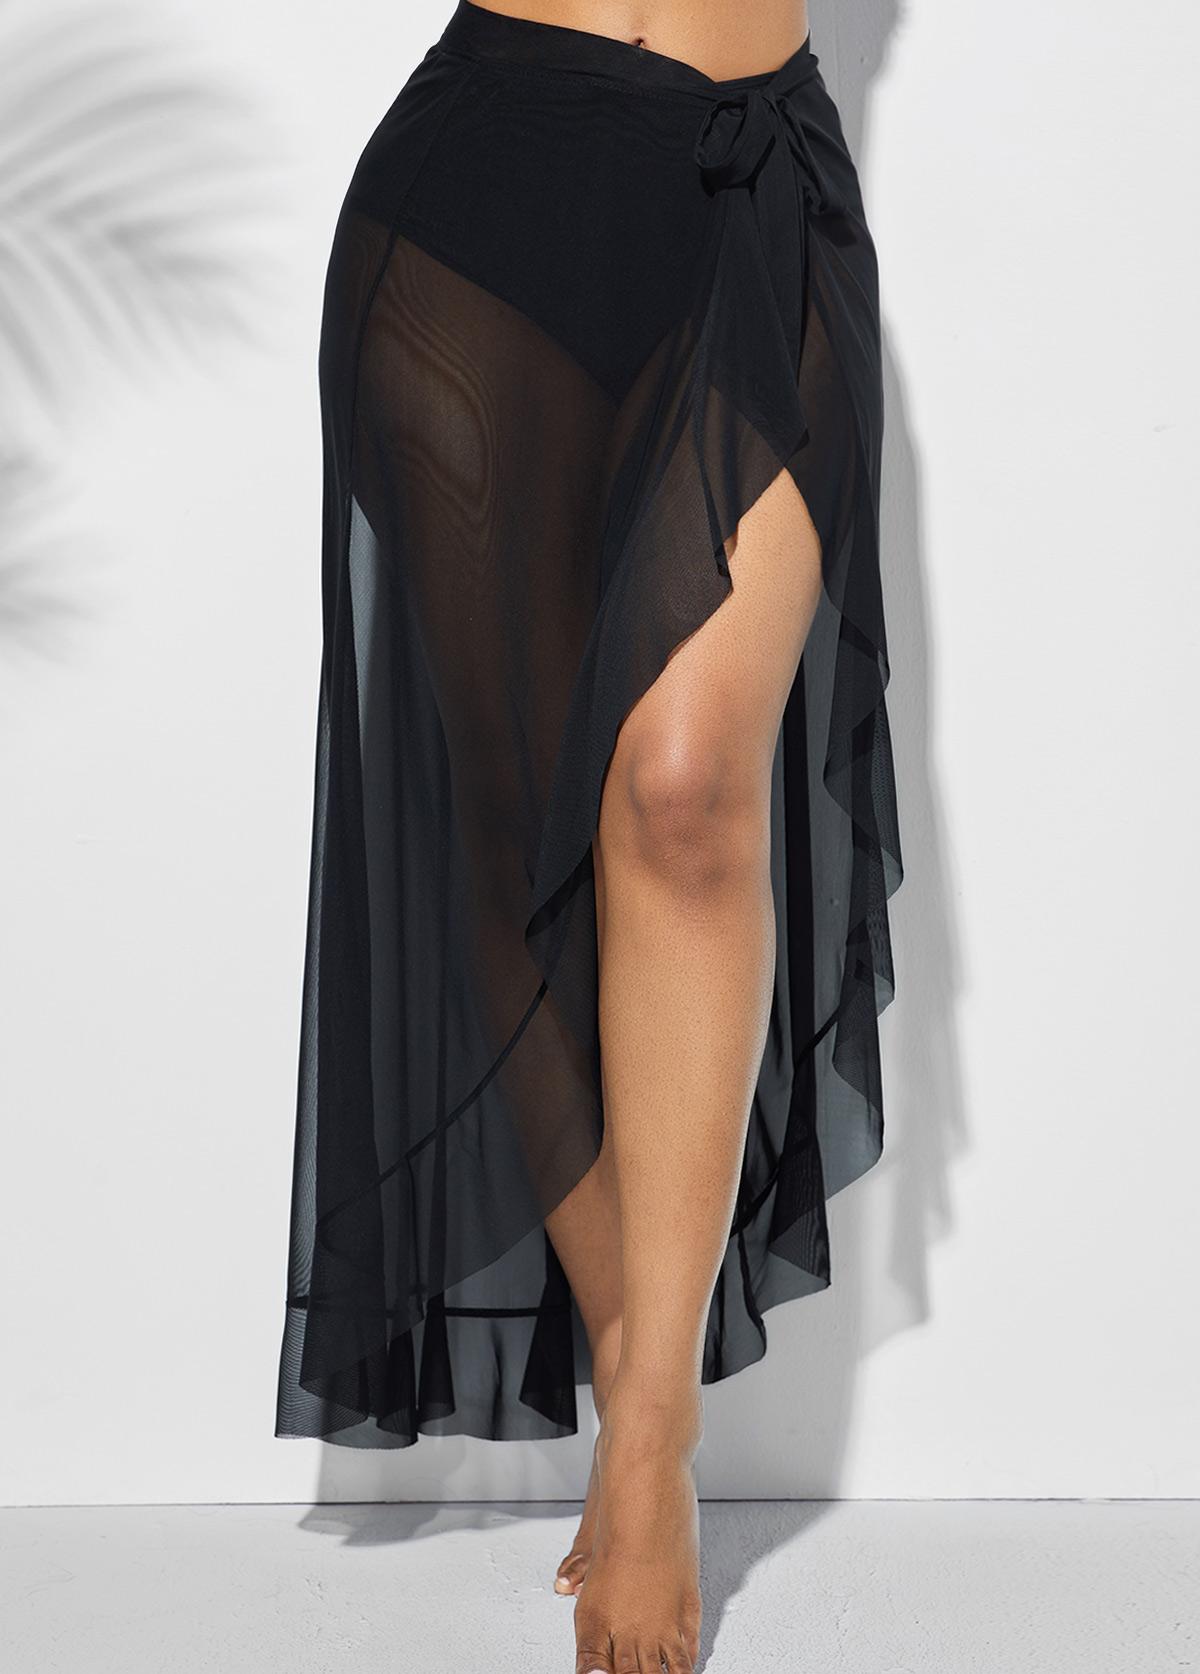 ROTITA Asymmetric Hem Side Slit One Piece Skirt